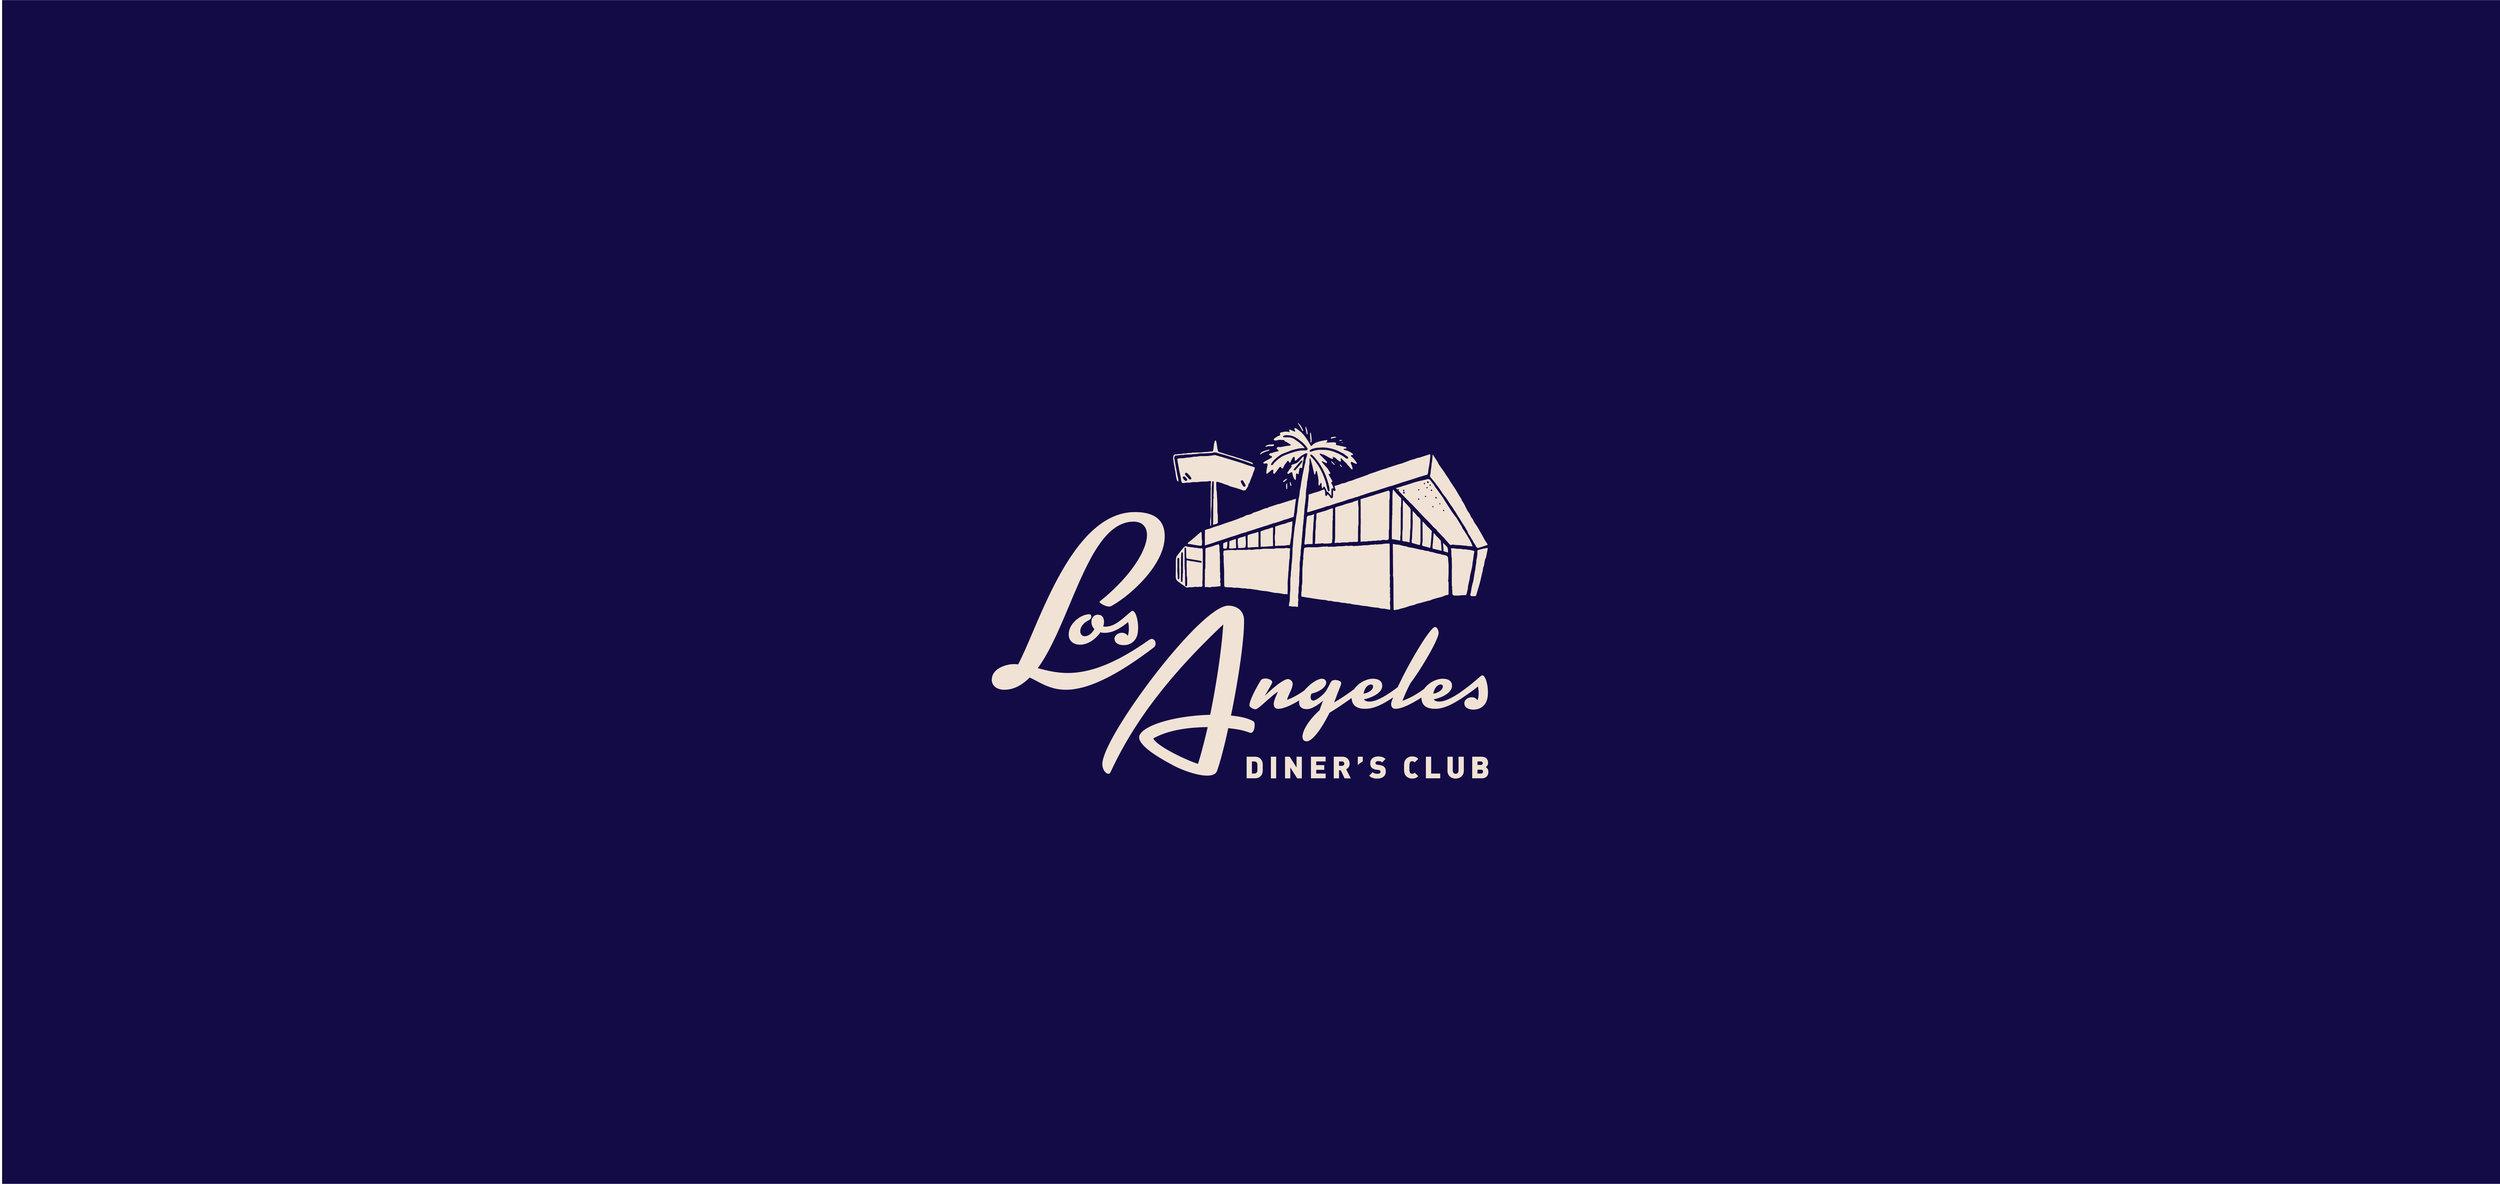 190830_logo layout_website-07.jpg